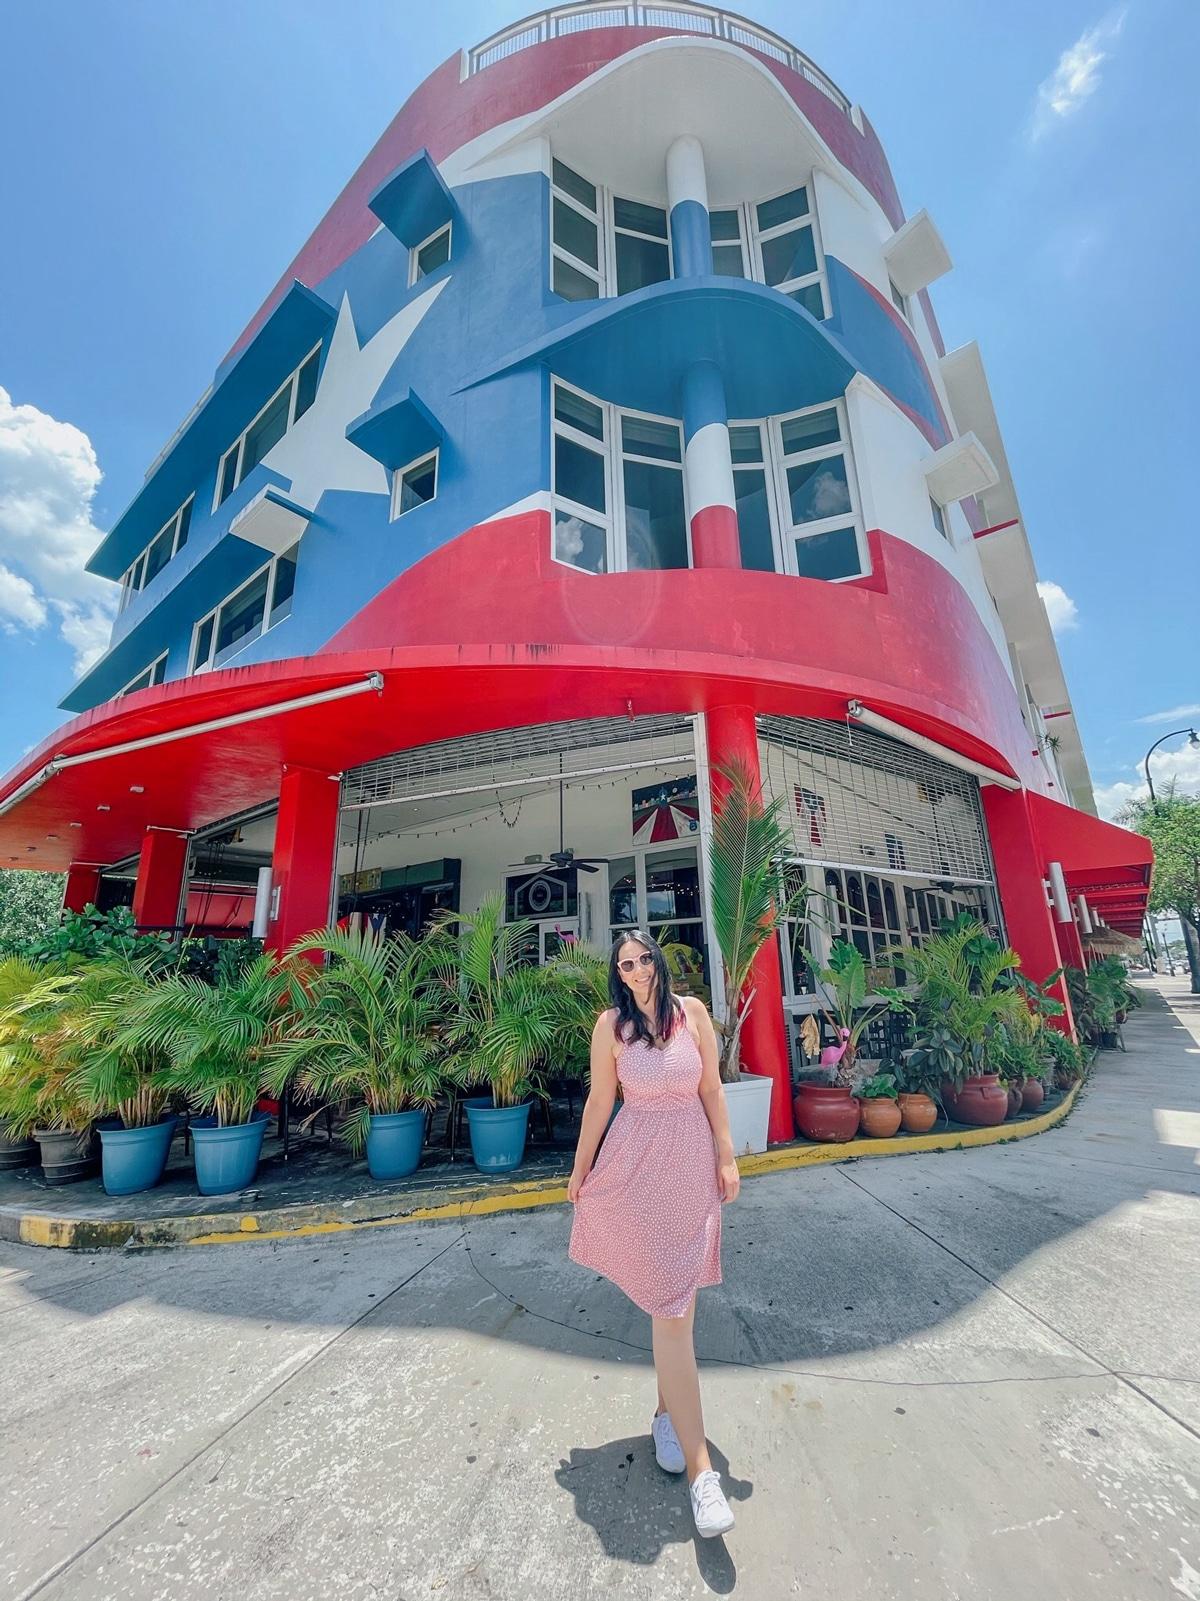 La Placita MiMo Miami Historic District Hidden Gem REstaurant for Brunch